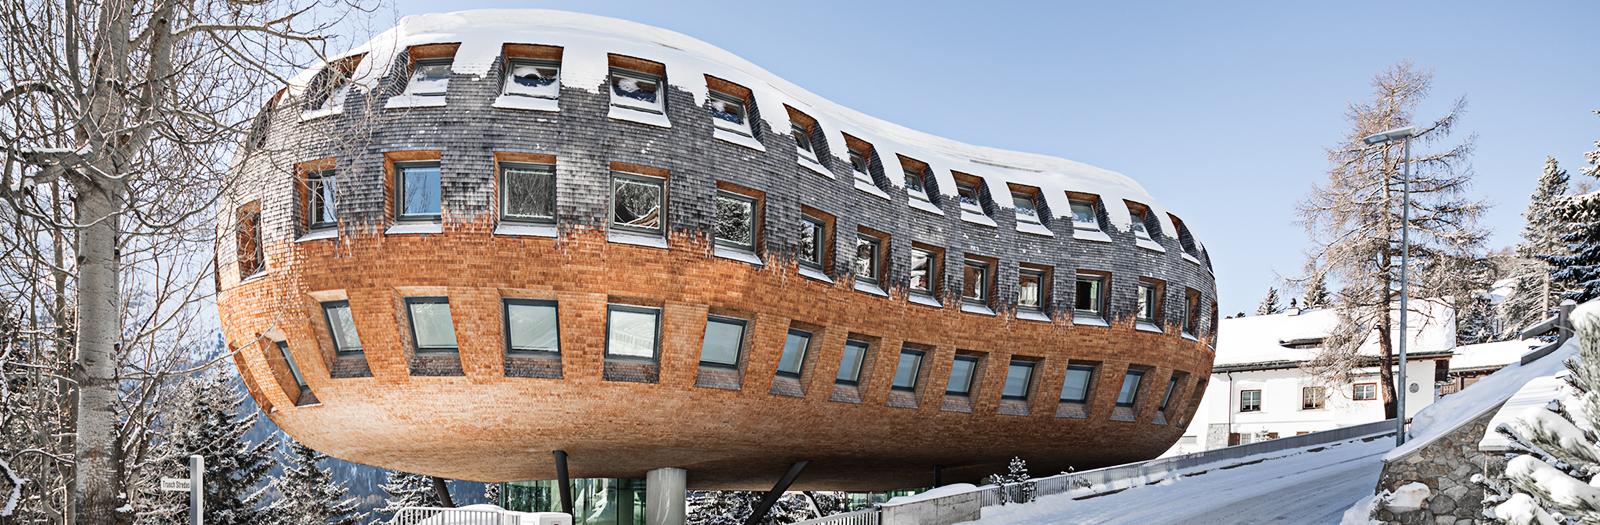 st moritz ski resort, st moritz switzerland, st moritz ski trip, st moritz ski vacation